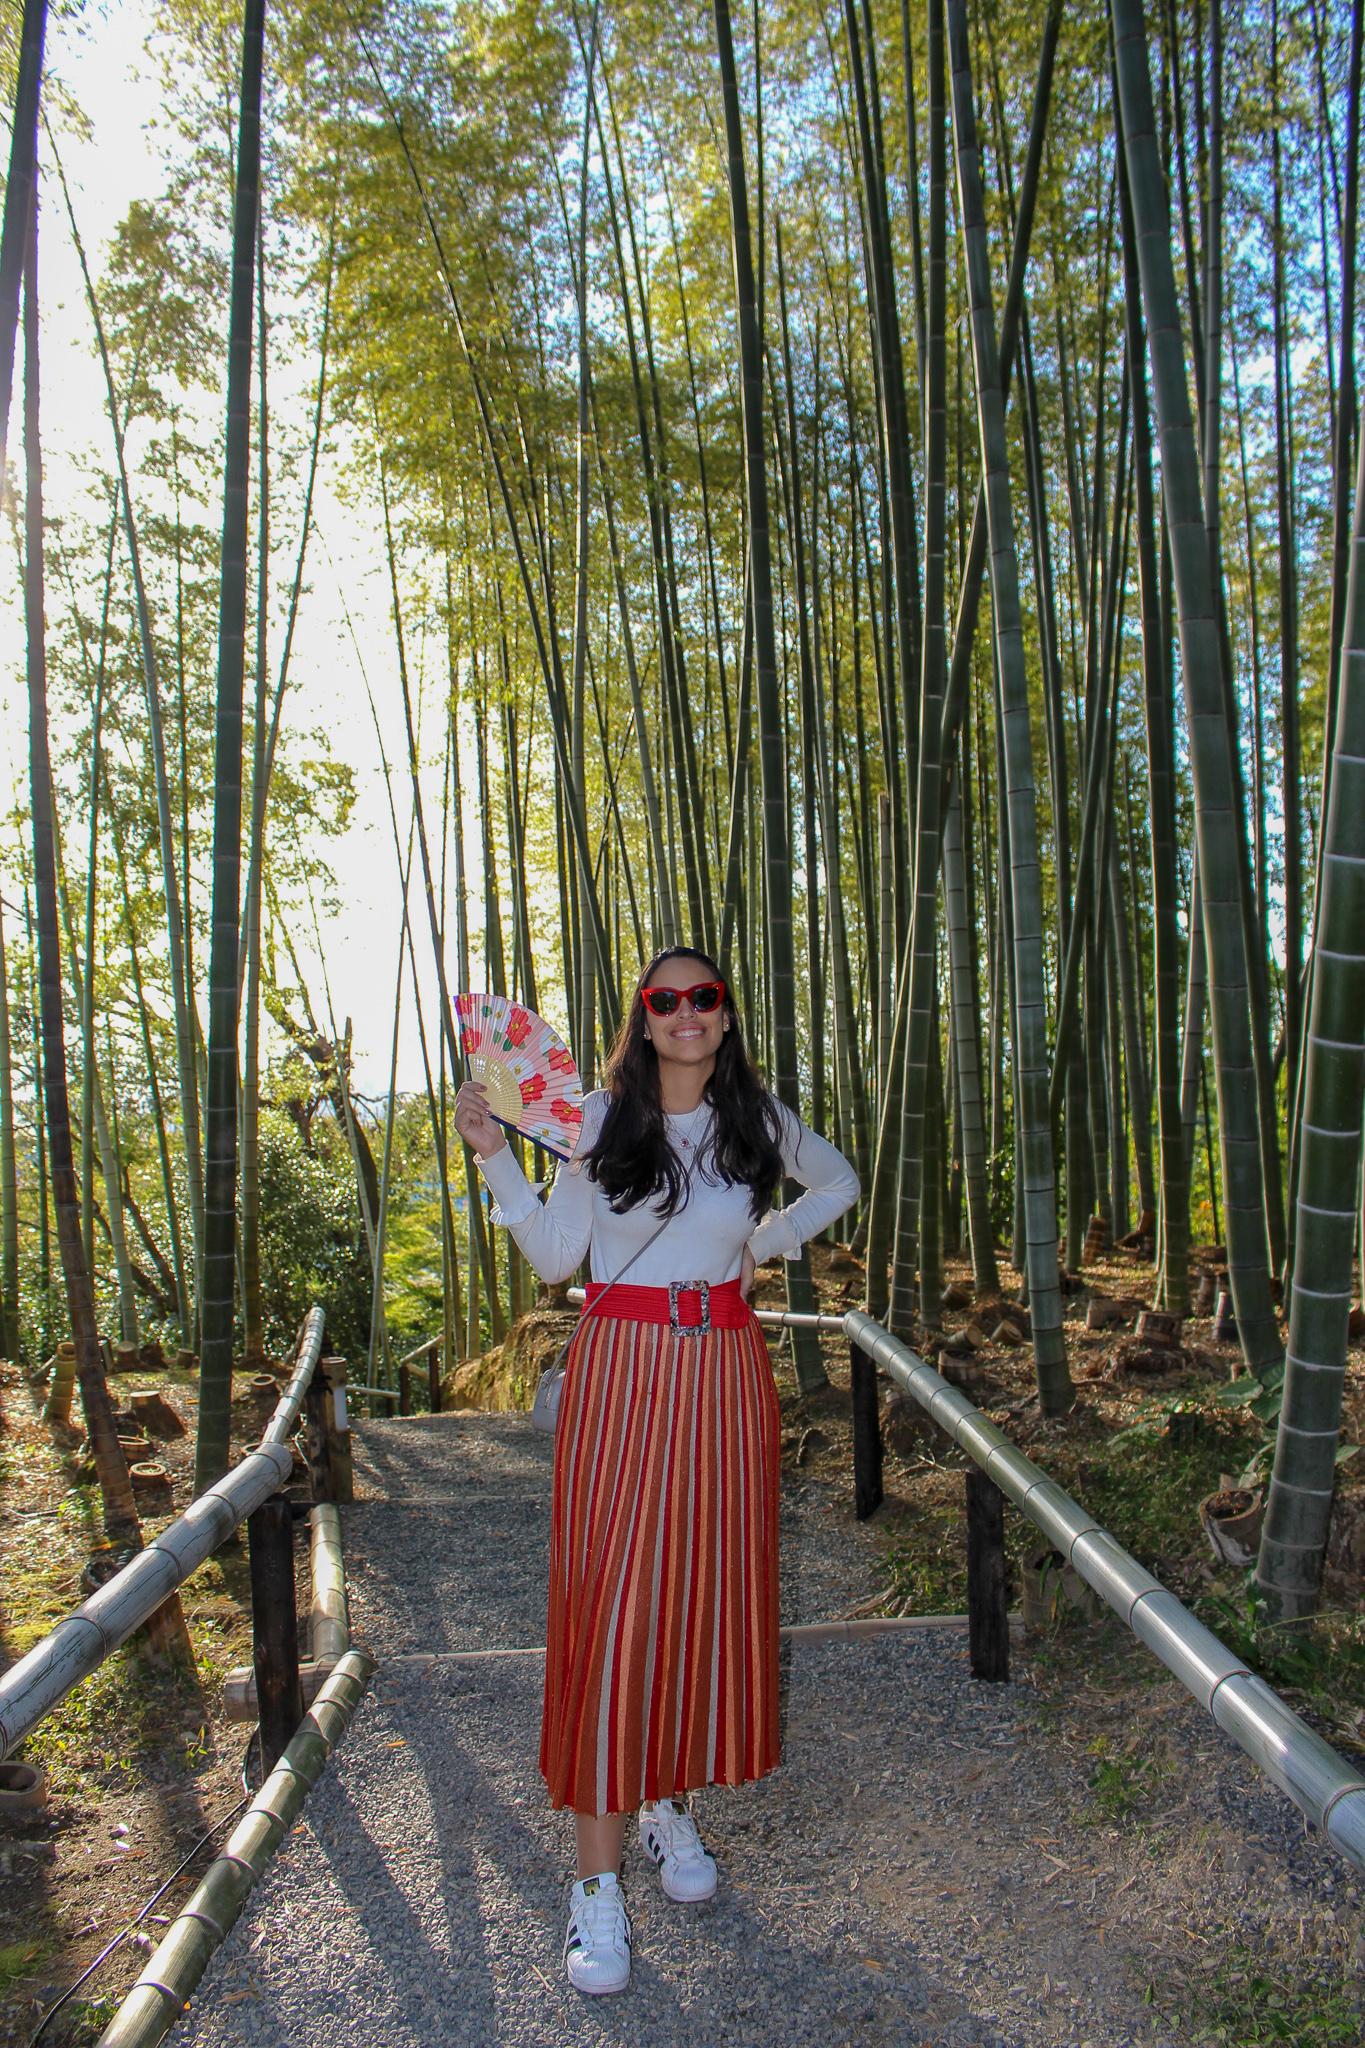 kodai_ji_floresta_de_bambu